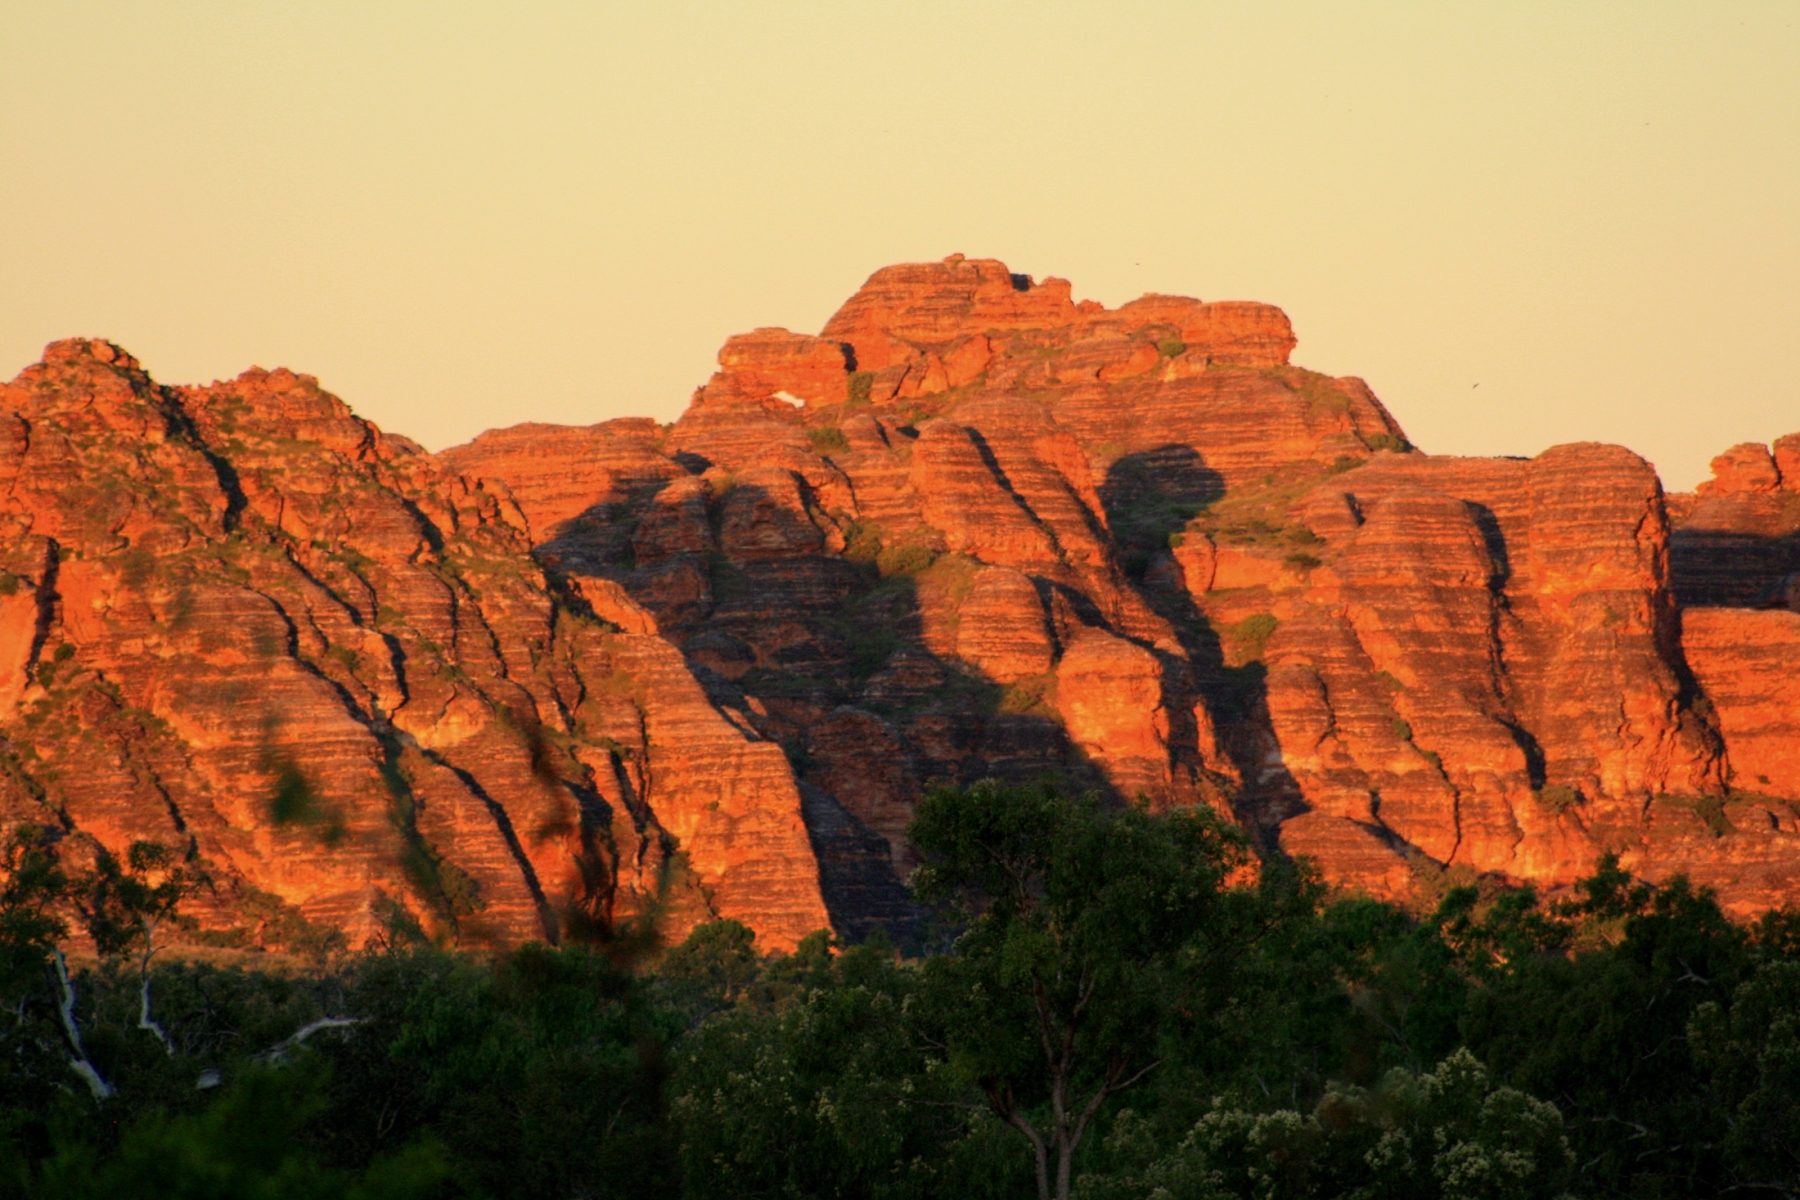 Bungle-Bungles-at-dusk-Purnululu-National-Park-Western-Australia